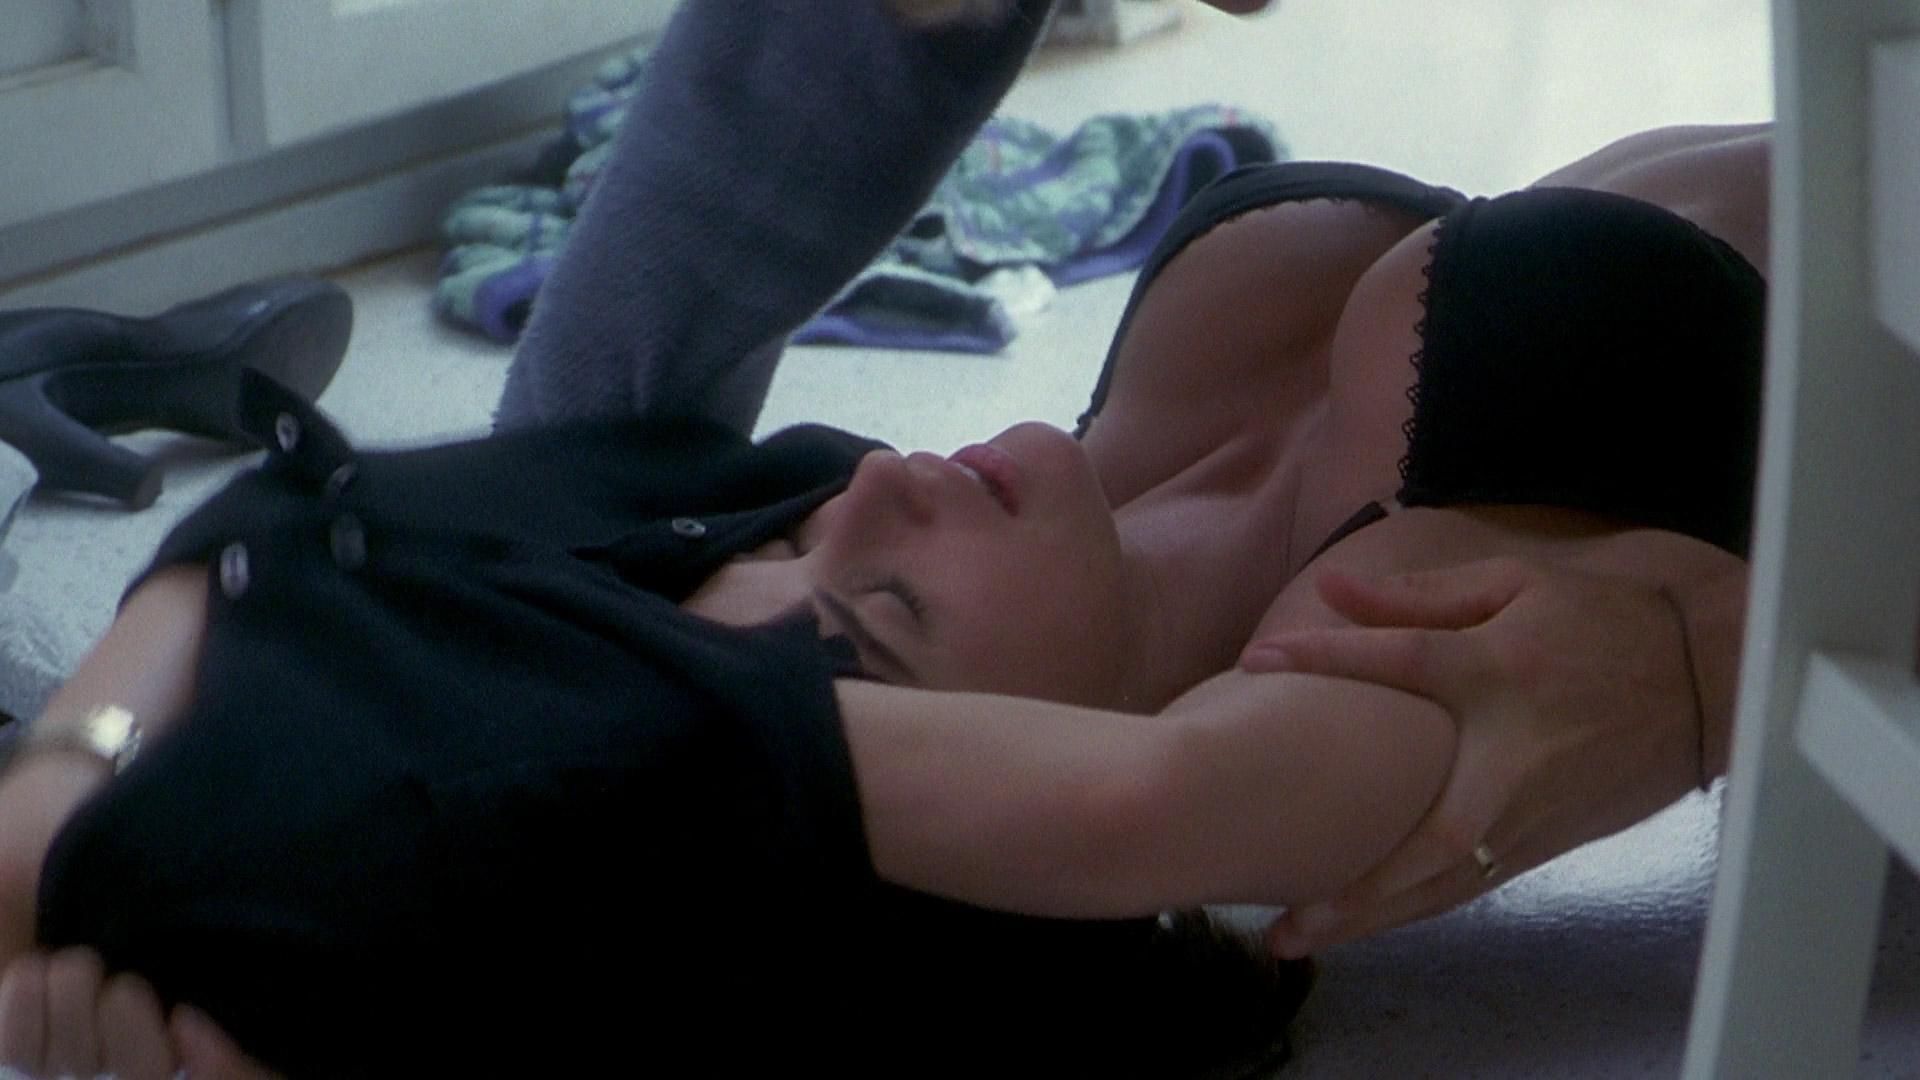 anal-milf-the-proposal-movie-nude-scene-put